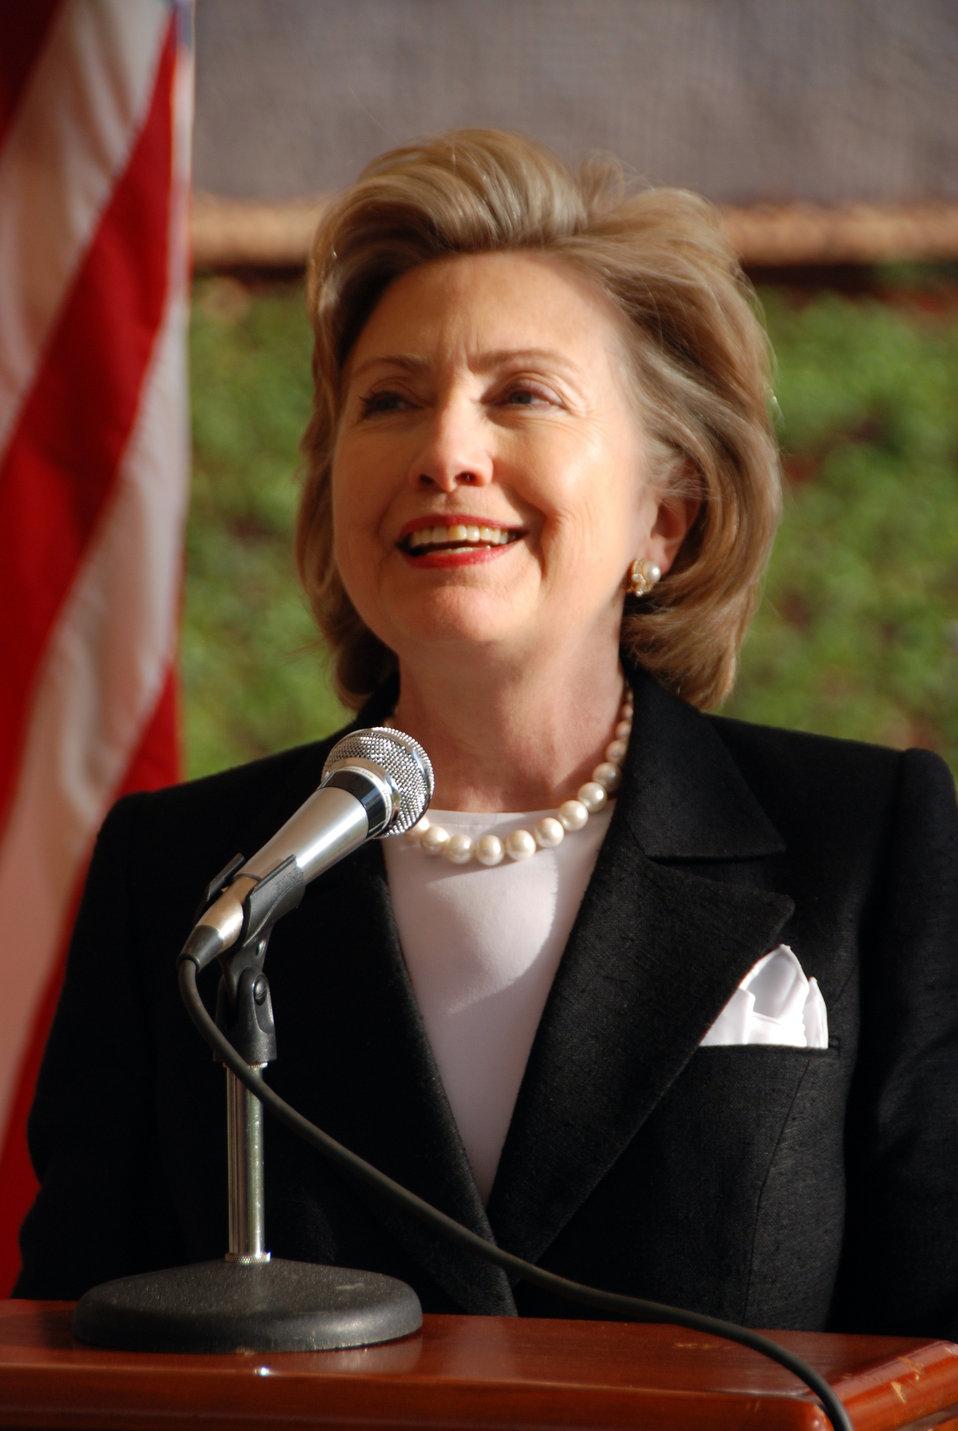 Secretary Clinton Addresses U.S. Embassy Staff in Kenya